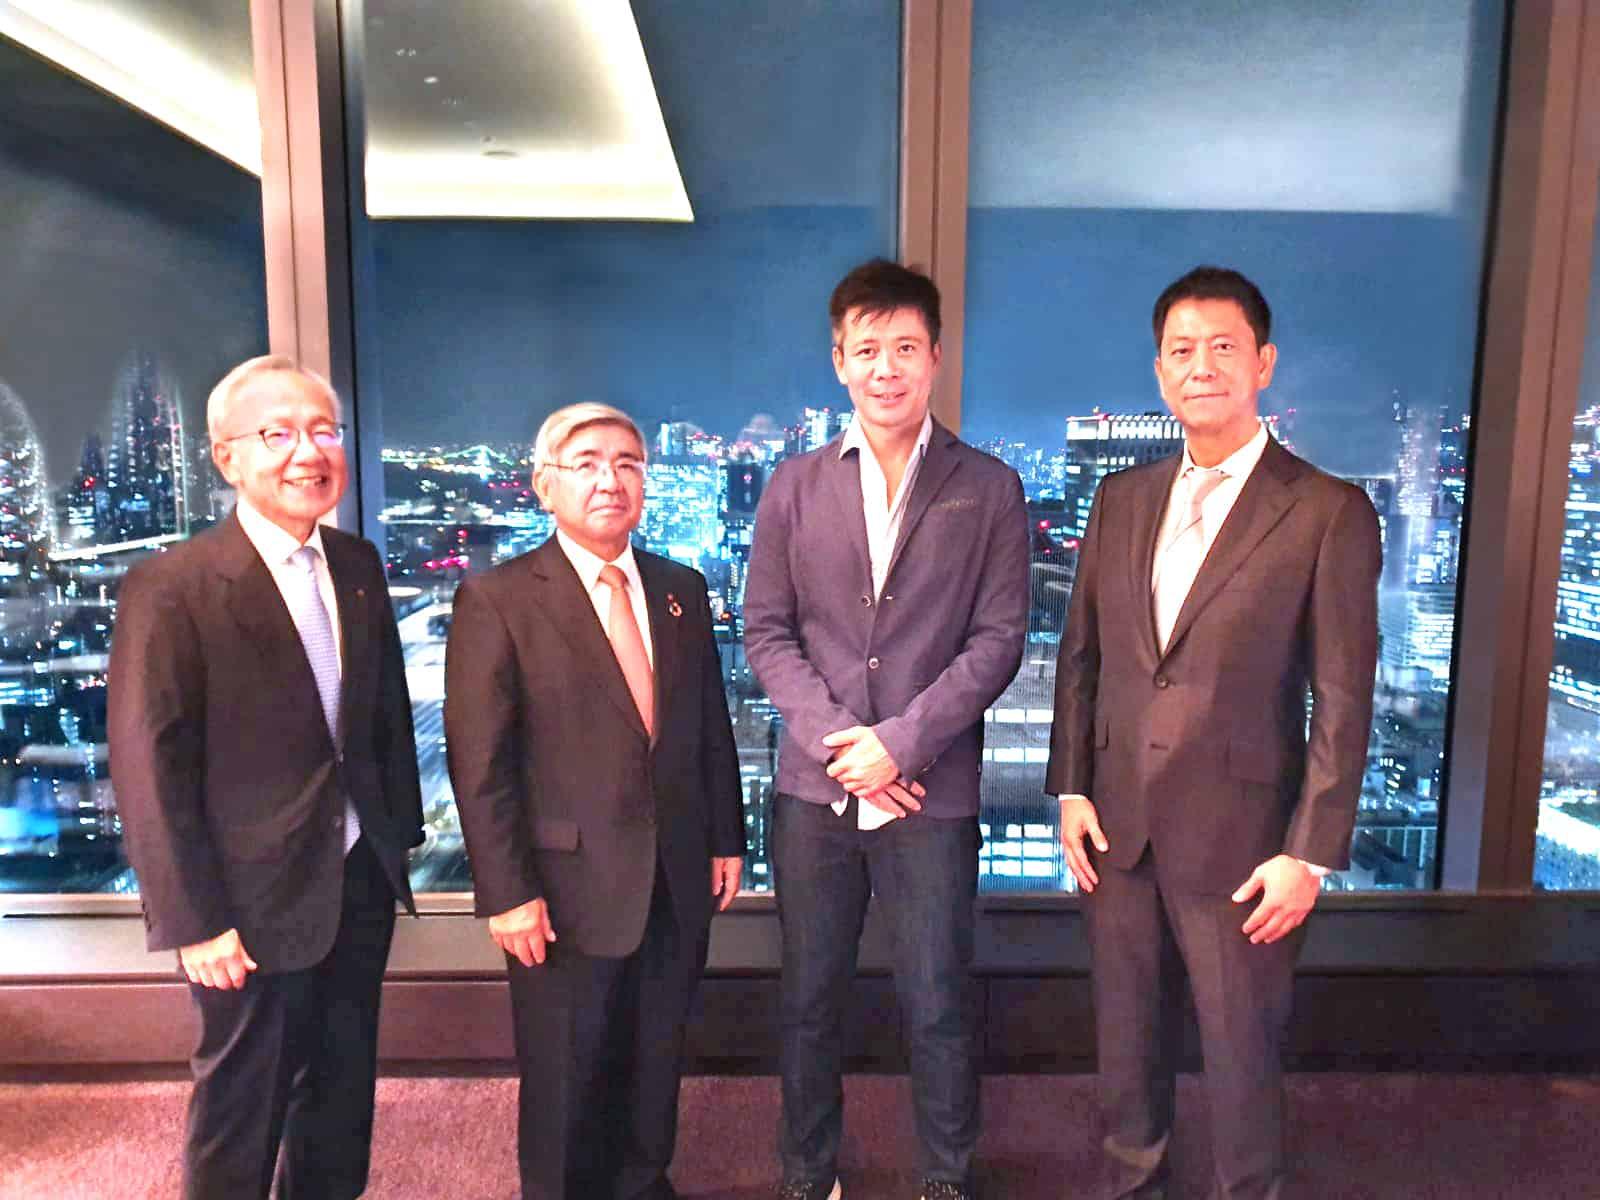 Digital Securities Platform iSTOX Raises $5 Million in Funding Led by Tokai Tokyo Financial Holdings